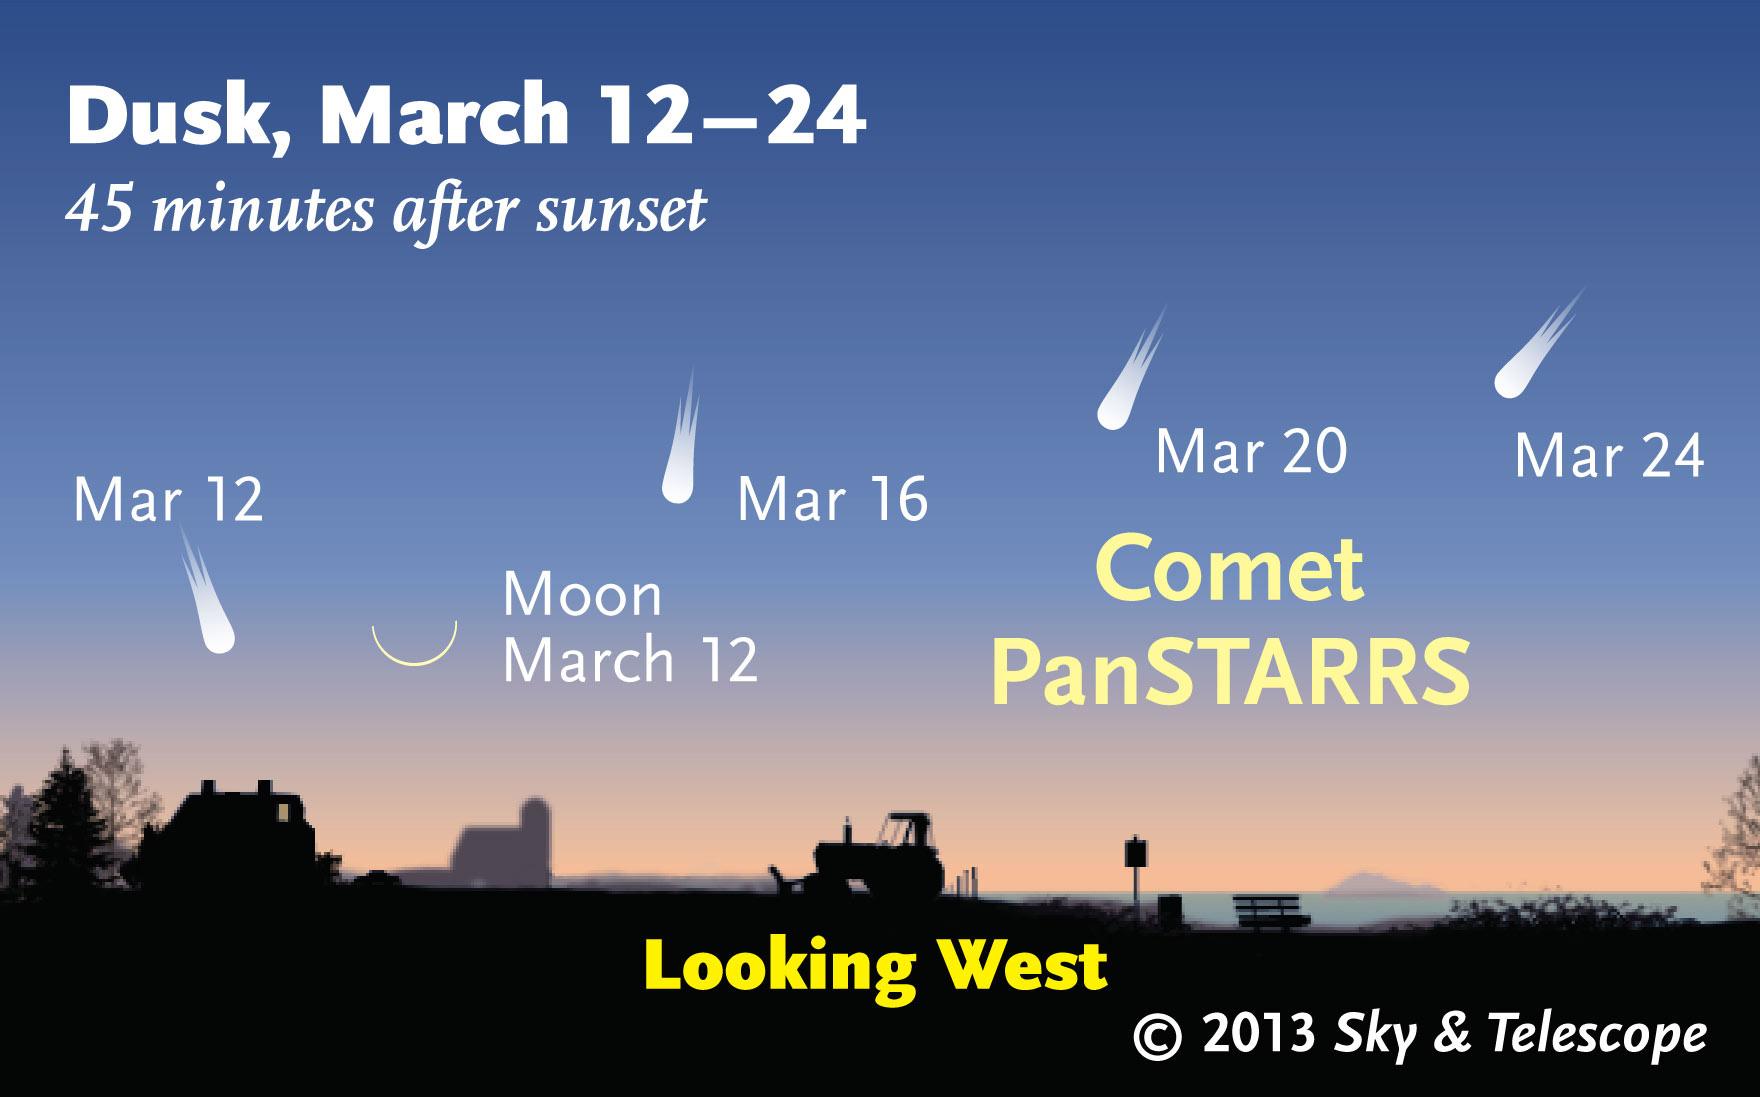 Календарь пролета кометы